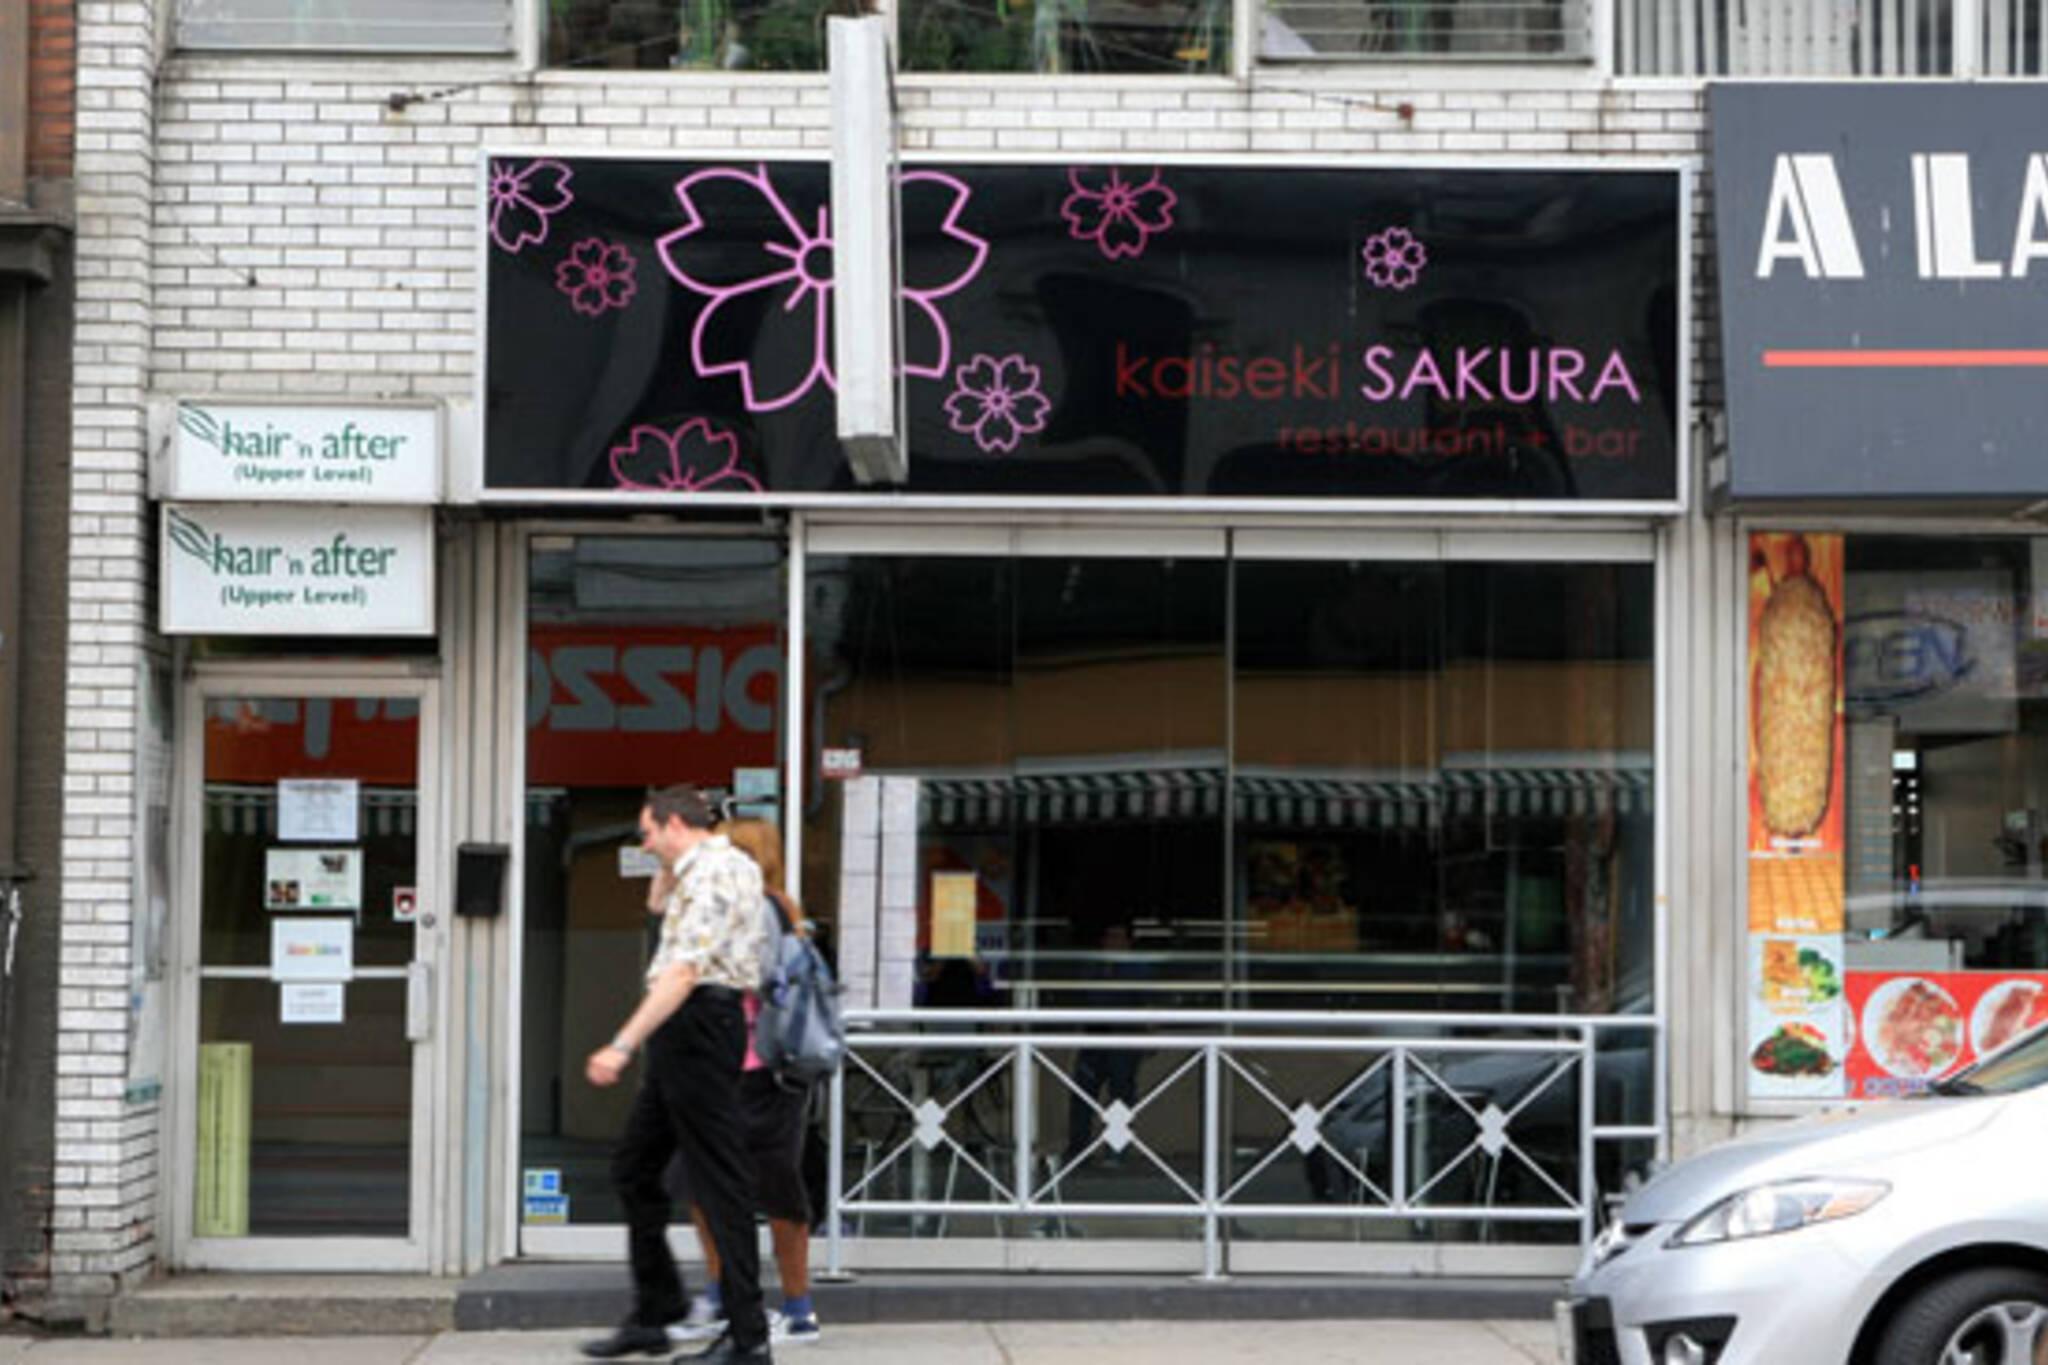 Kaiseki Sakura Toronto